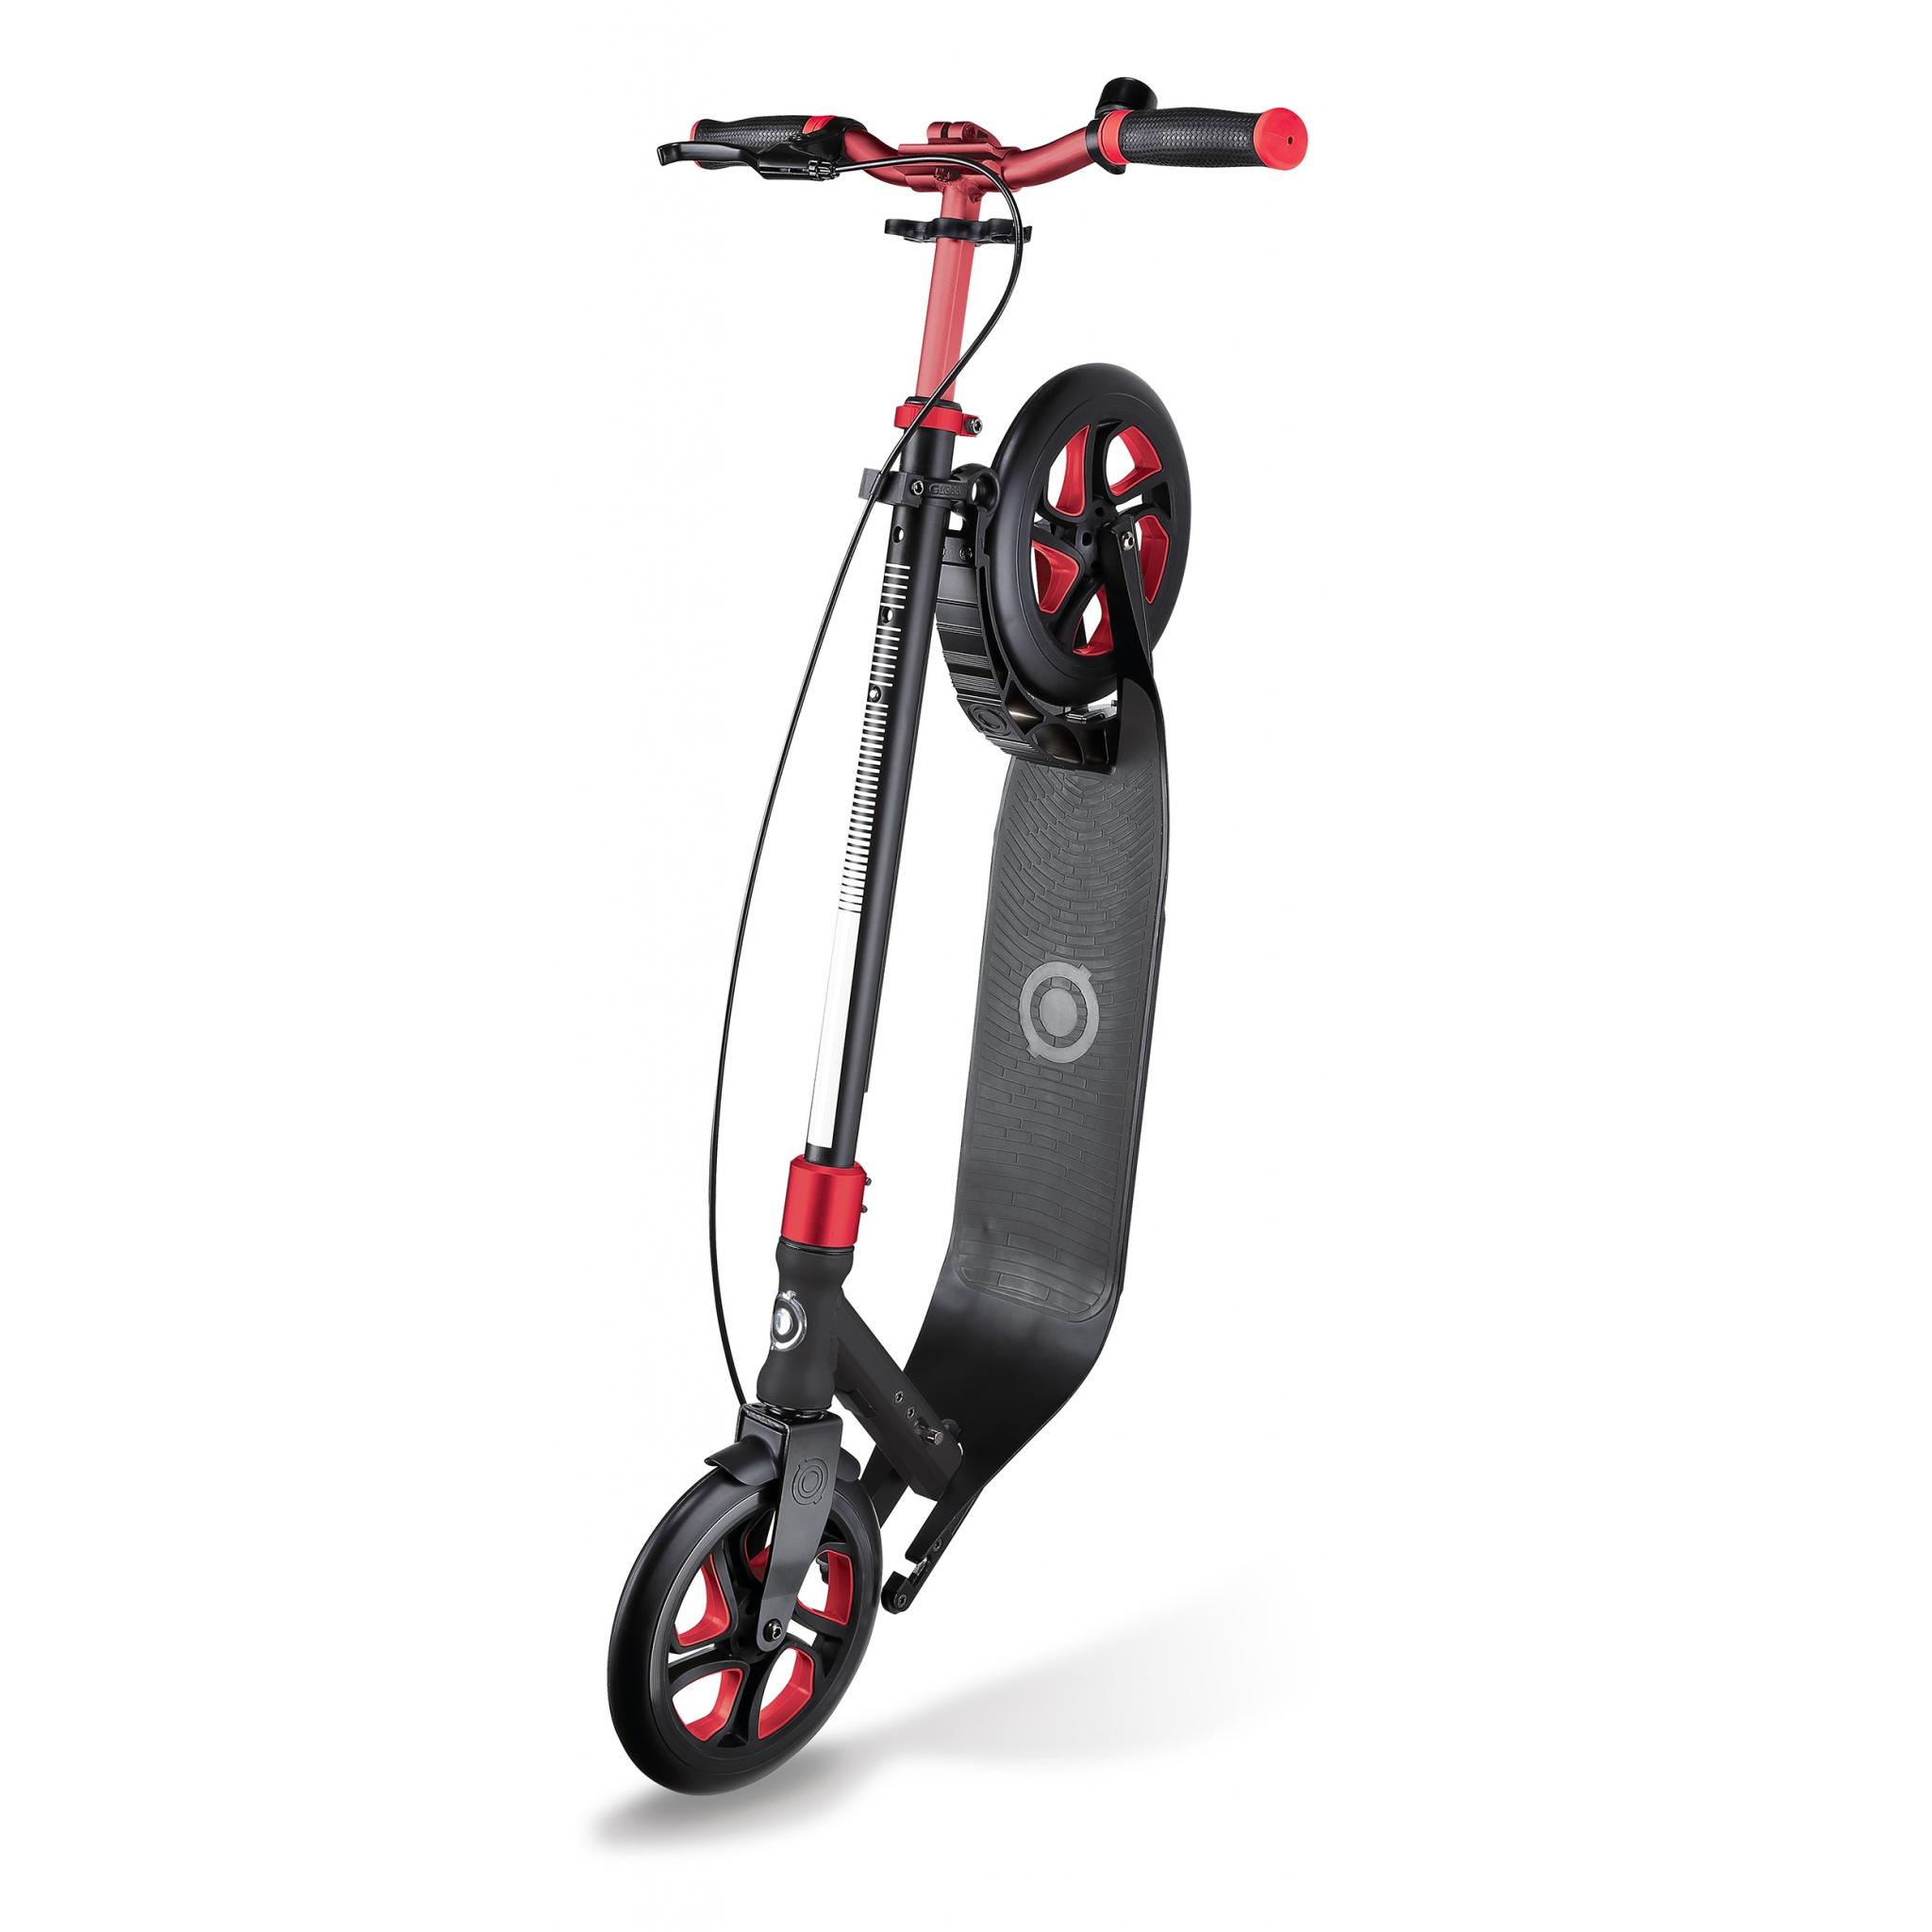 big wheel kick scooter - Globber ONE NL 230 ULTIMATE 2